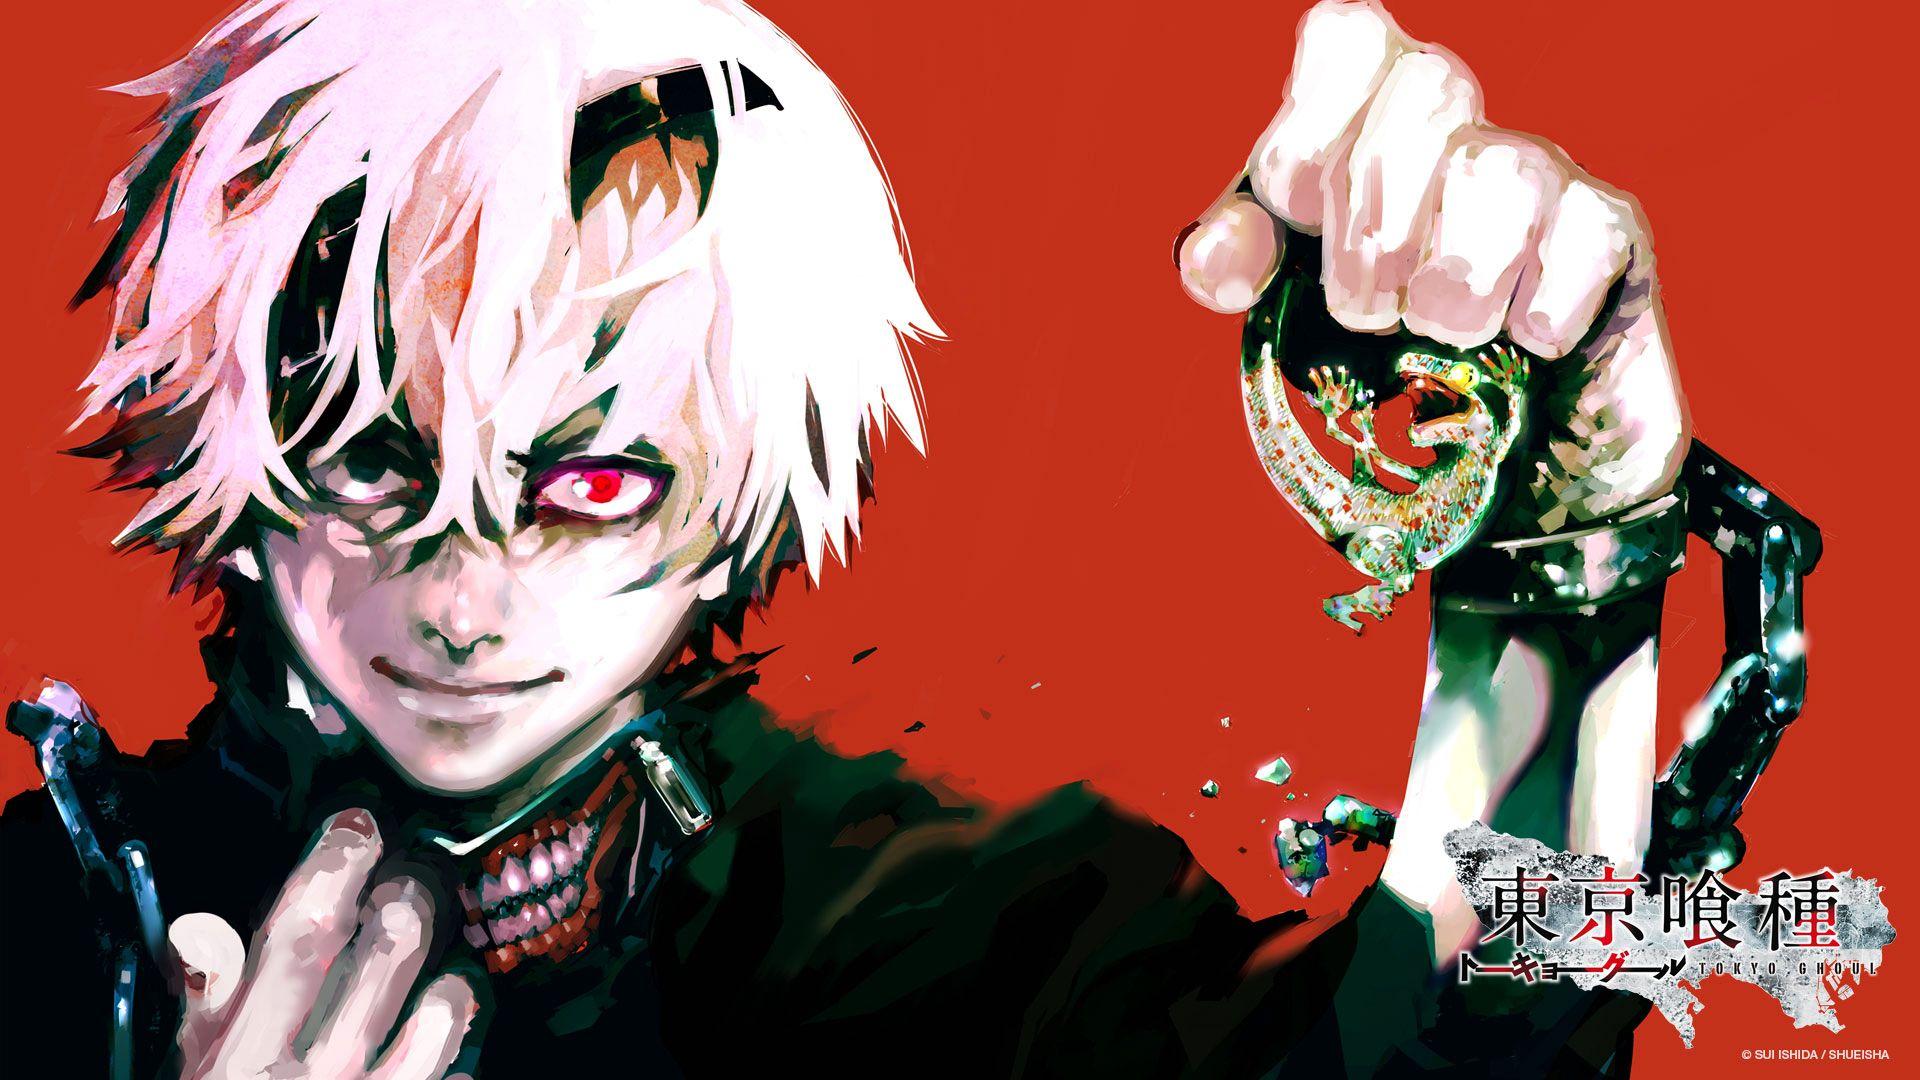 4011391-tokyo-ghoul-anime-hd-1920x1080